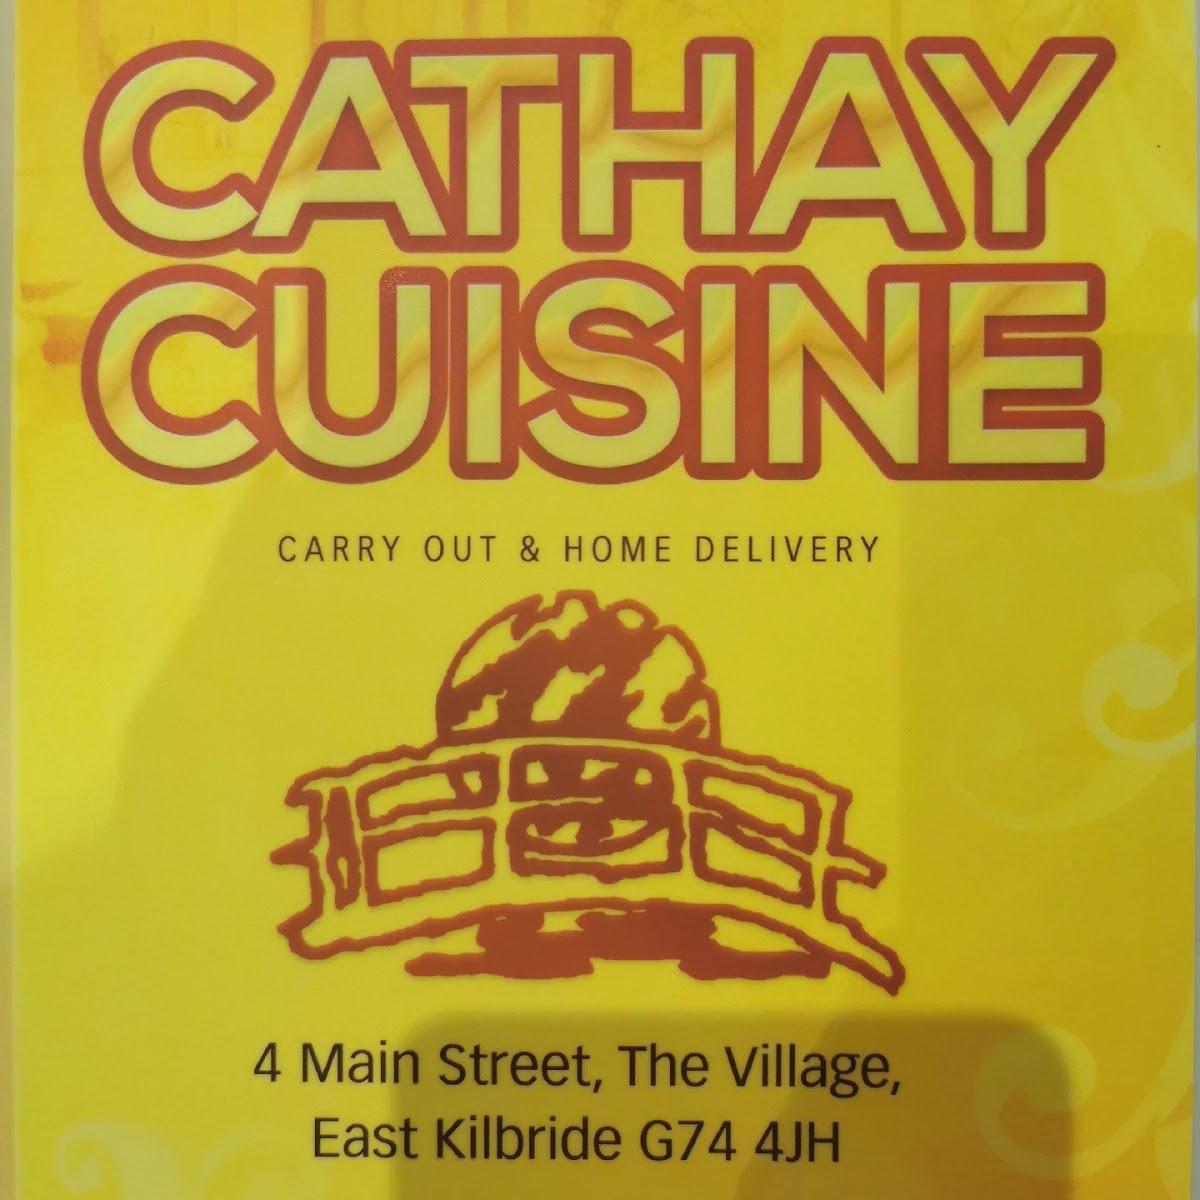 Cathay Cuisine 4 Main St In East Kilbride Restaurant Menu And